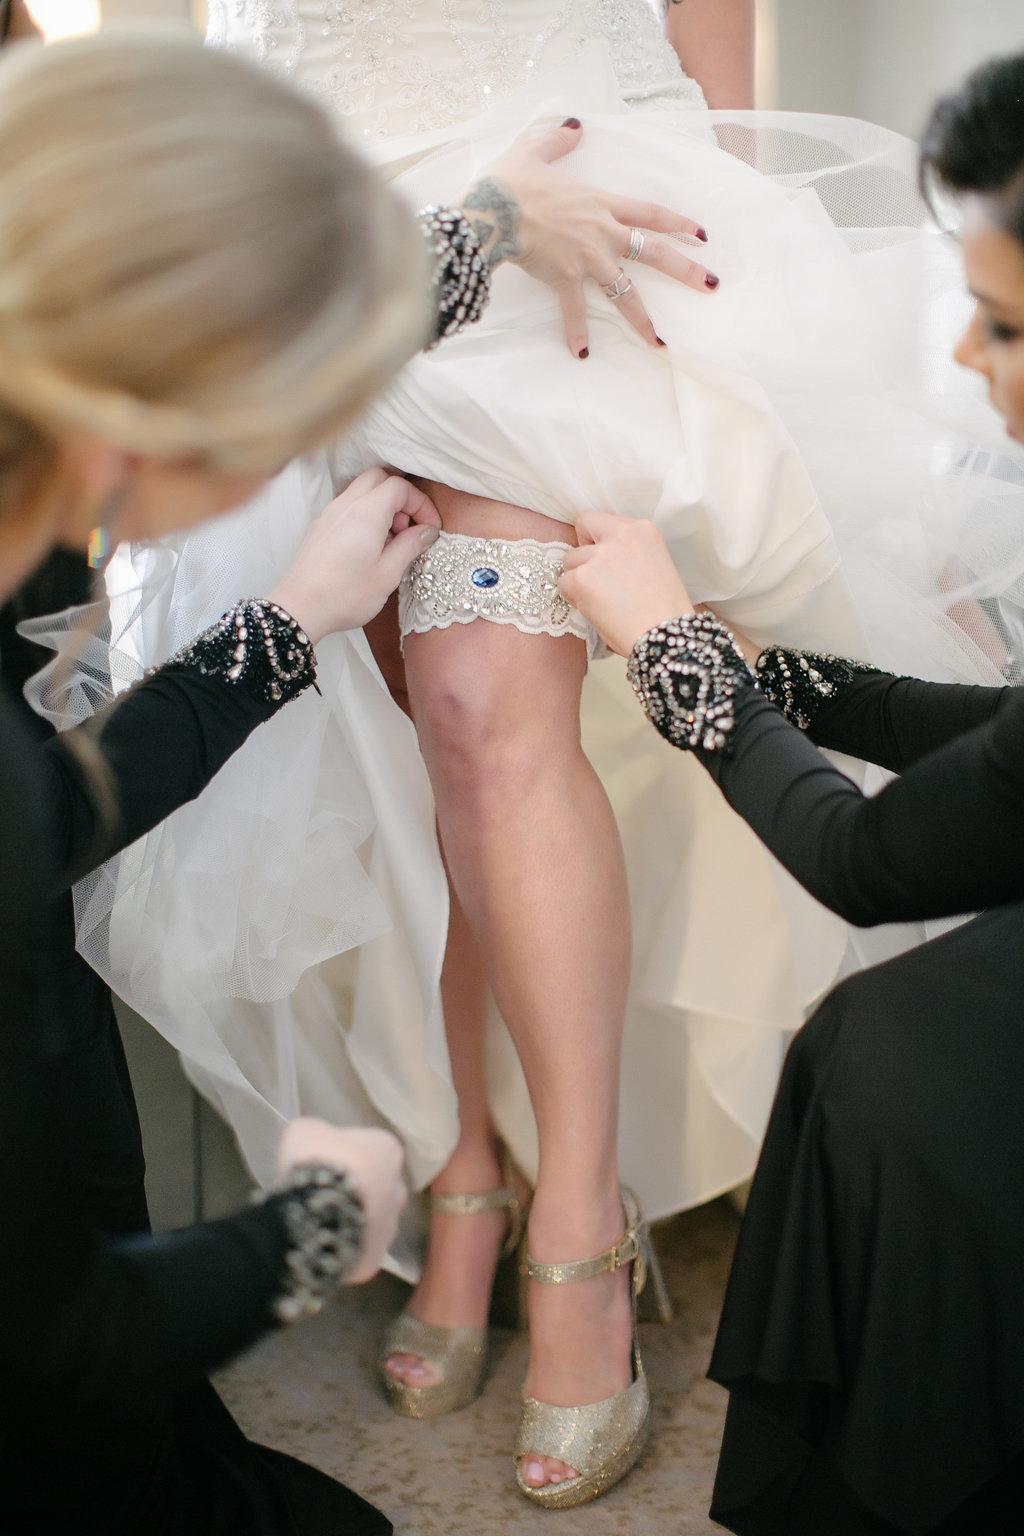 bridesmaids put garter on bride, garter with blue jewel